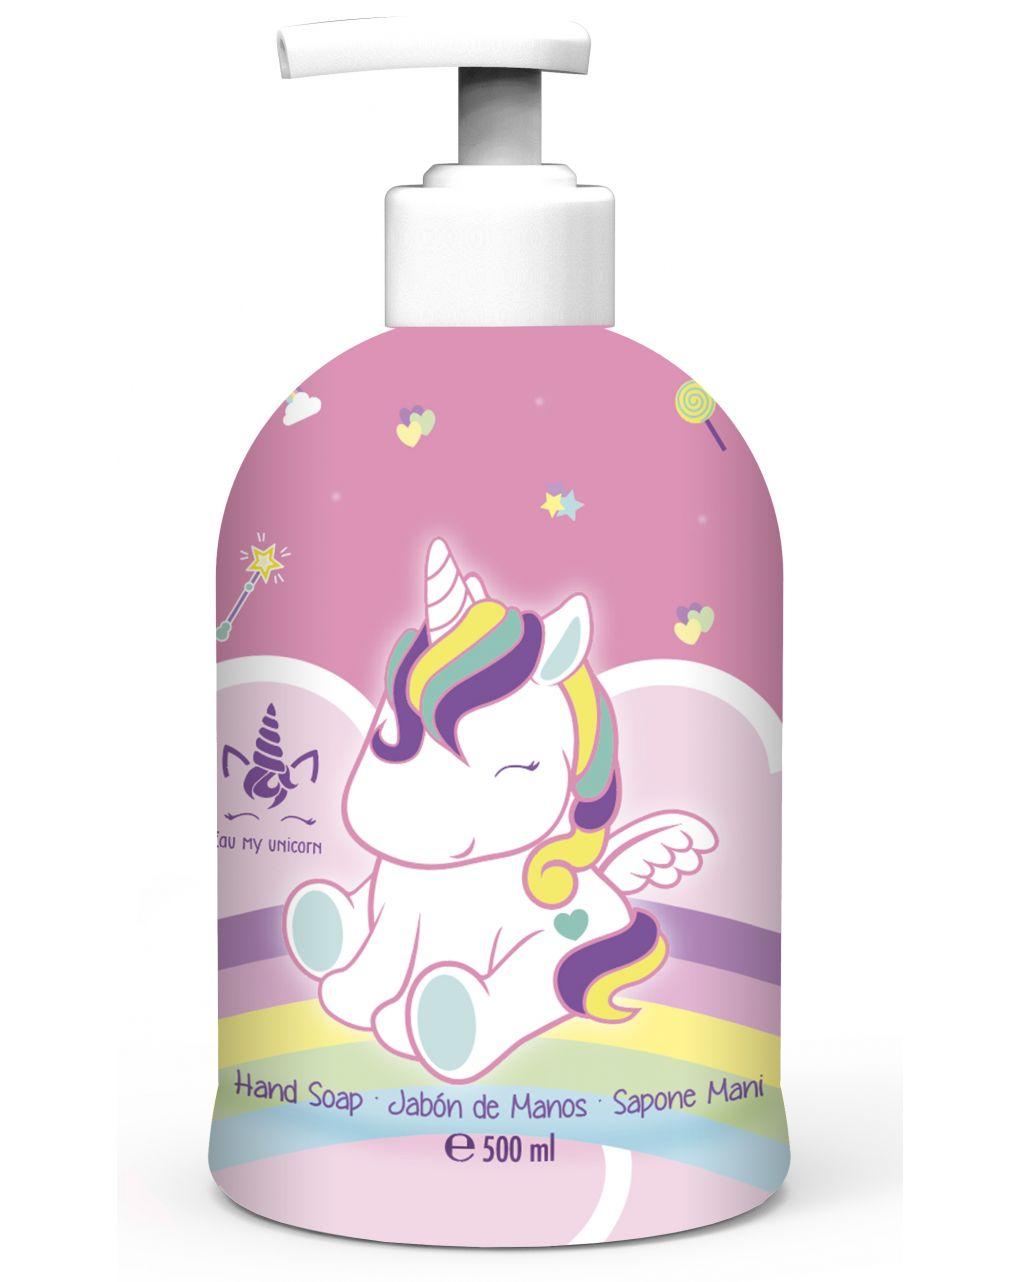 Air-val eau my unicorn sapone mani 500ml - Eau my unicorn